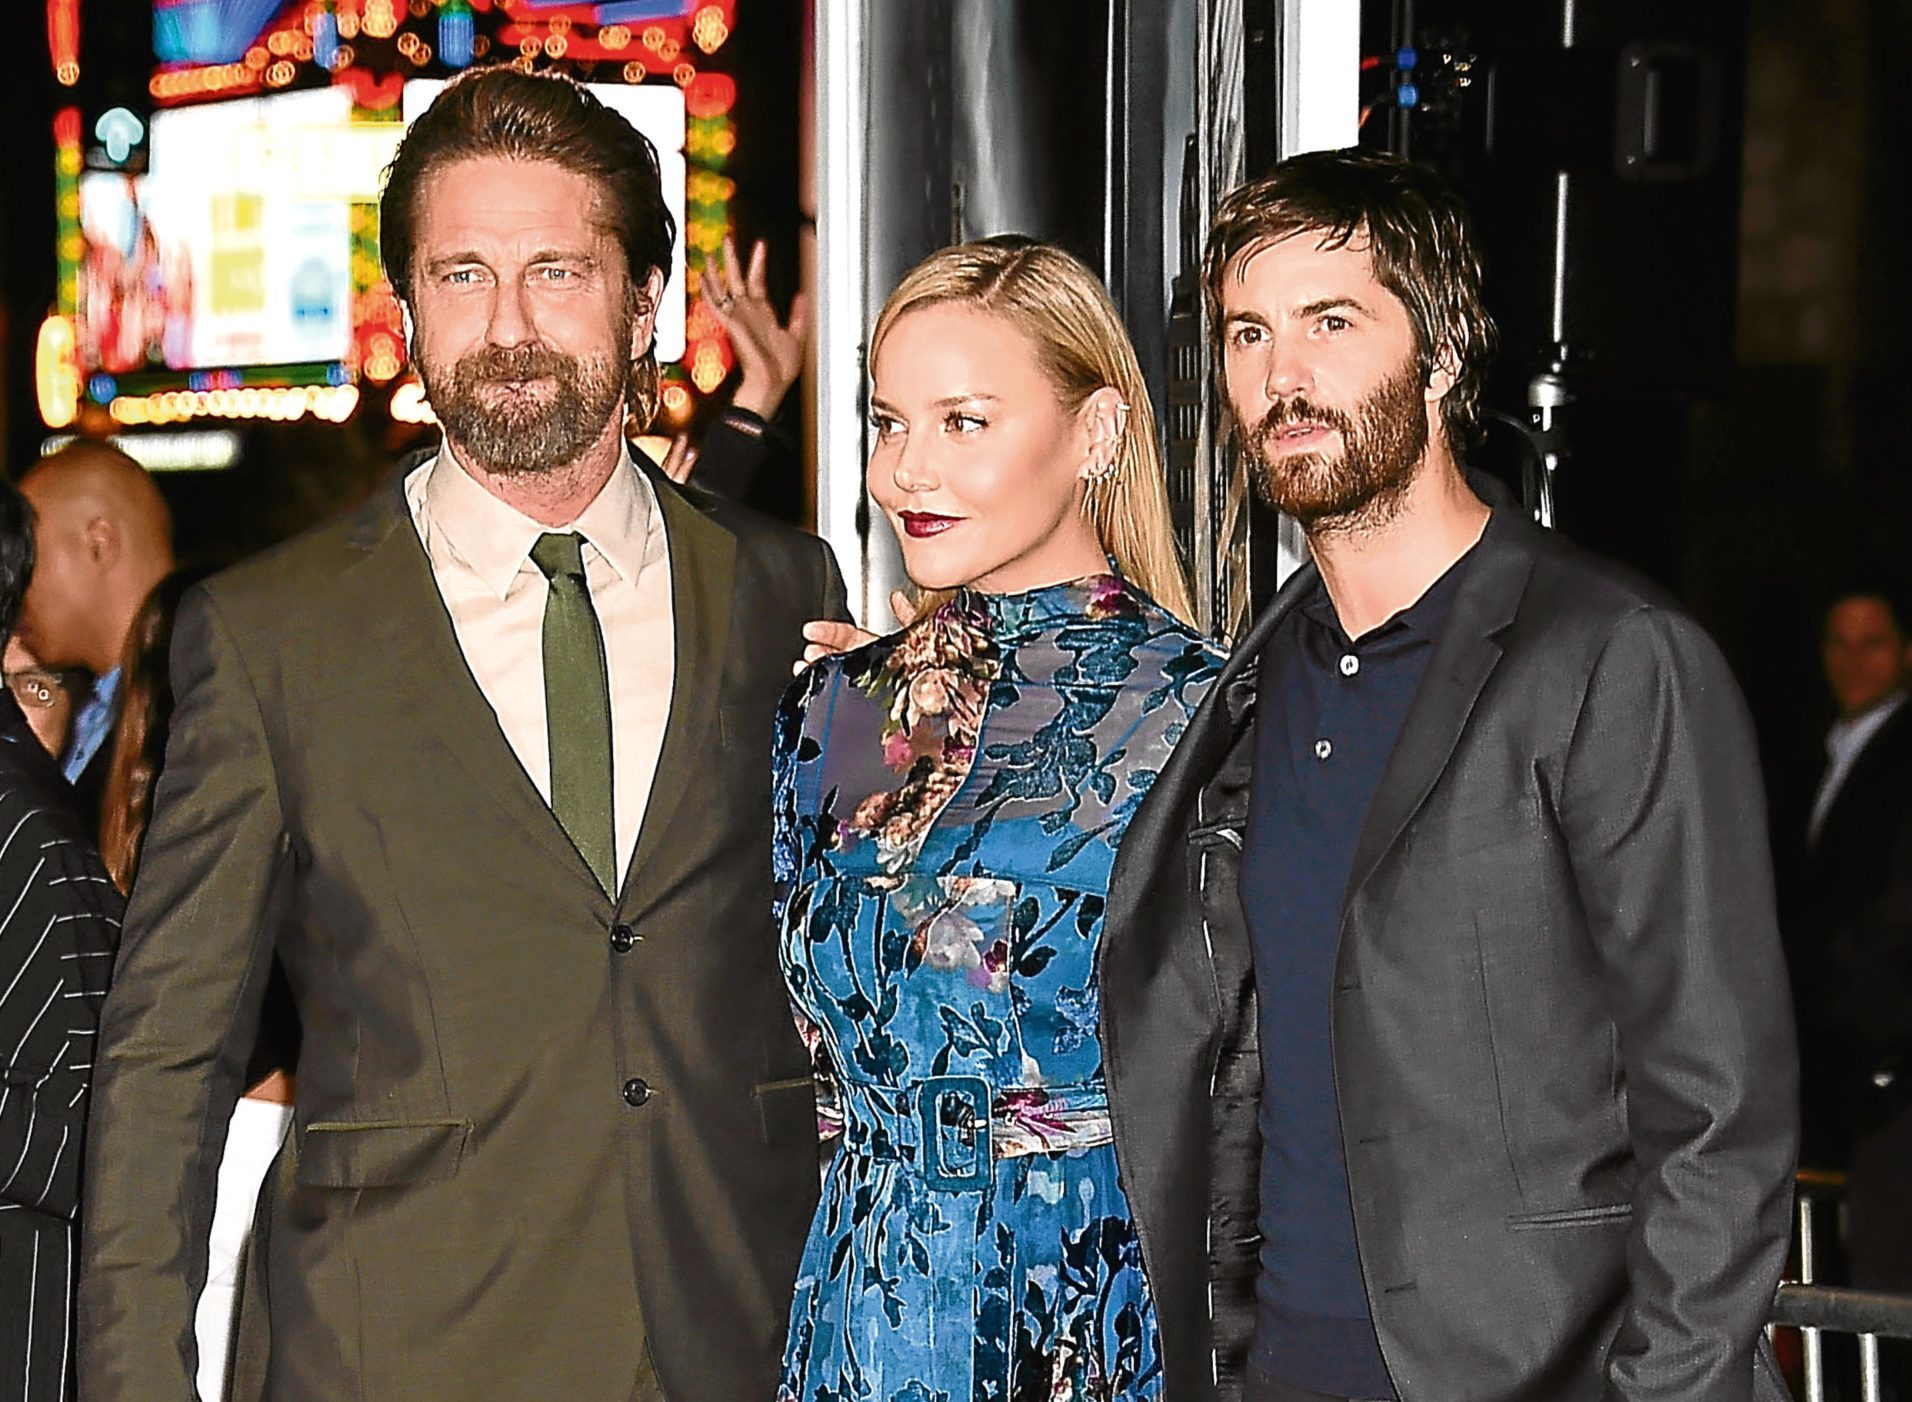 (L-R) Actors Gerard Butler, Abbie Cornish and Jim Sturgess attend the premiere of Warner Bros. Pictures' 'Geostorm' (Jeffrey Mayer/WireImage)